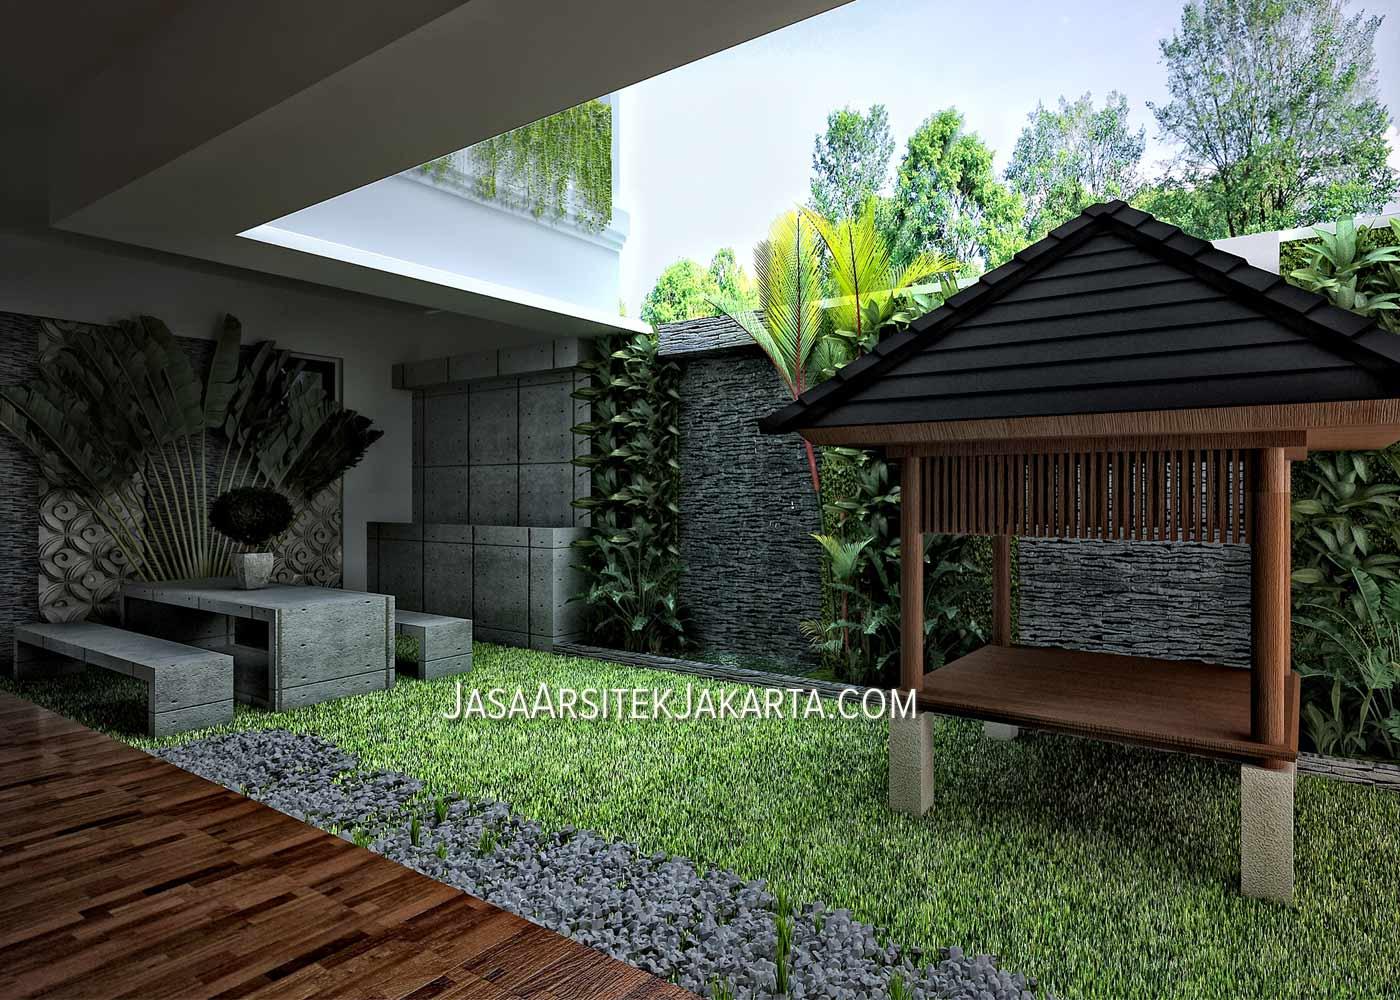 Jasa Arsitek Jakarta Desain Villa Kontraktor Bali